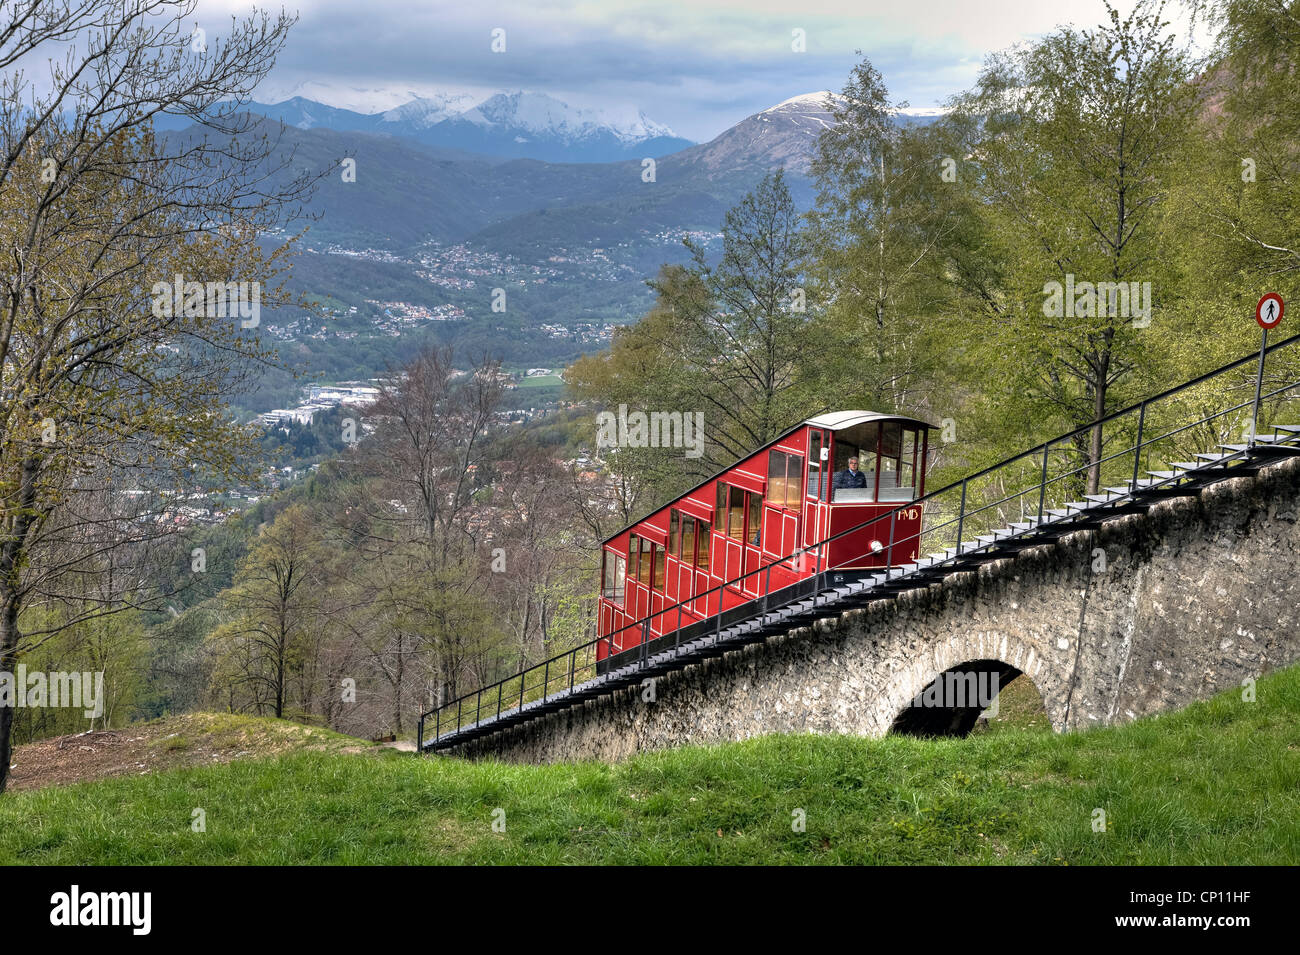 Funicular, Monte Bre, Lugano, Ticino, Switzerland - Stock Image